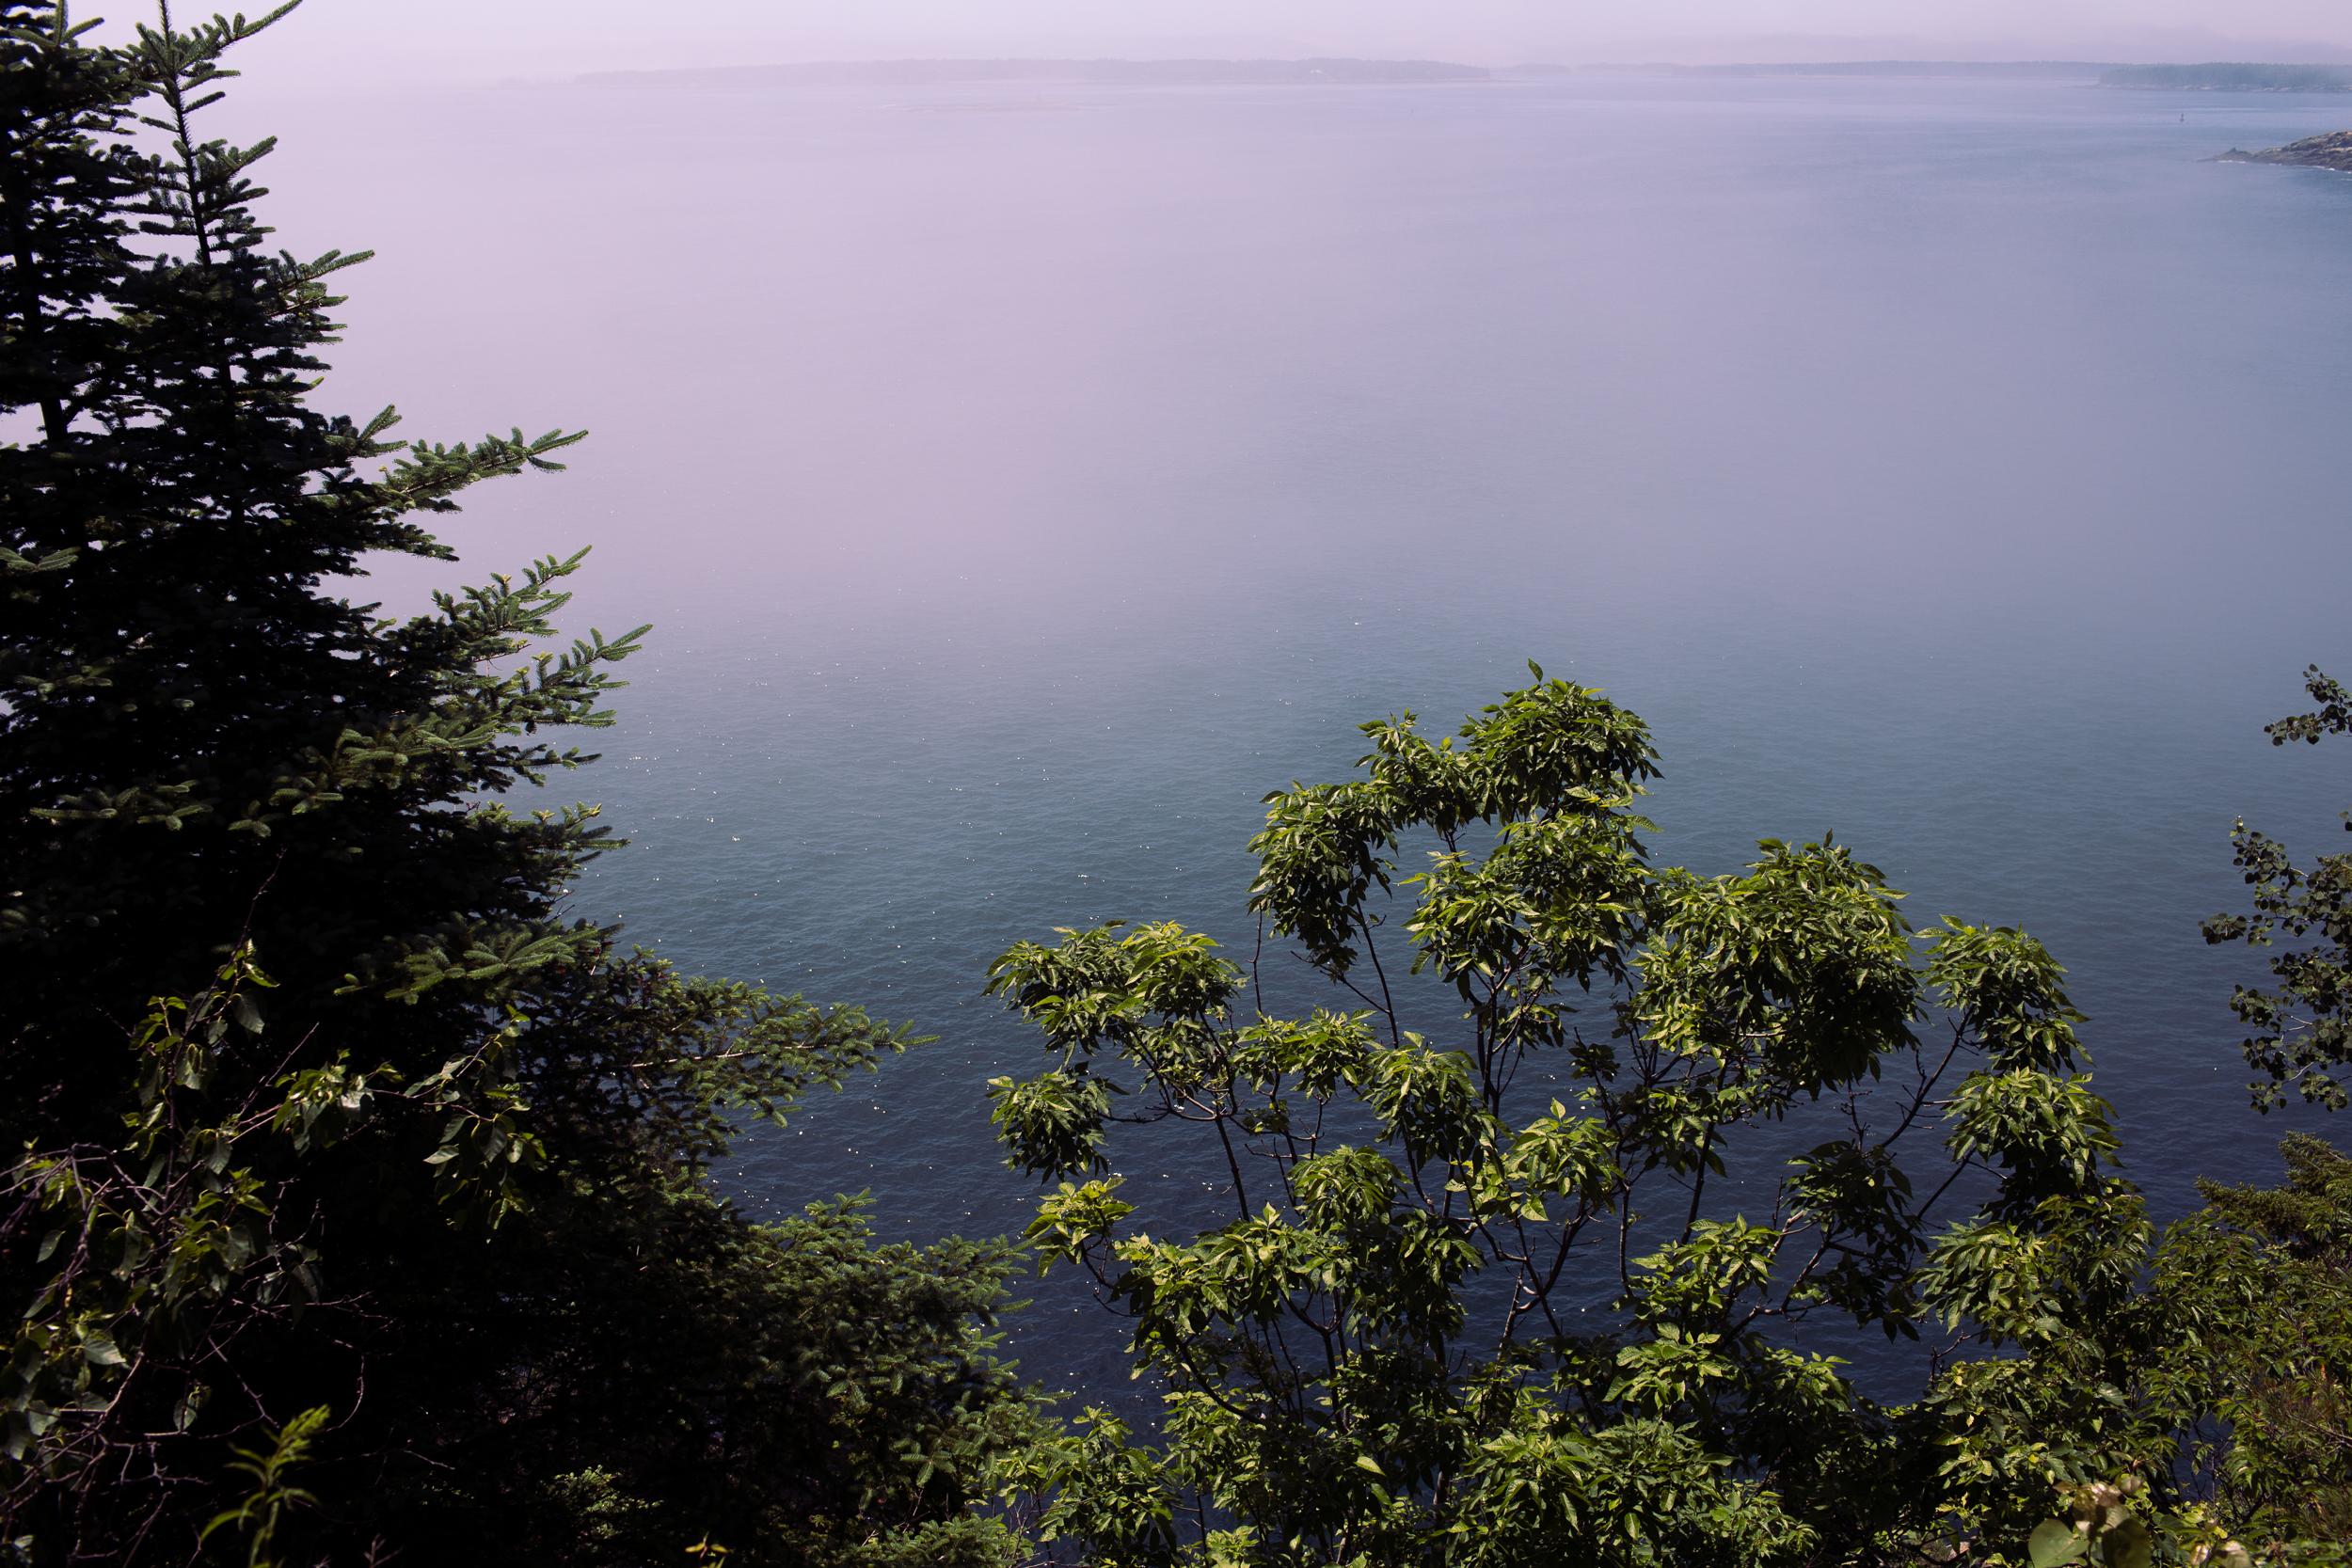 acadia-national-park-anna-mcclellan-photography-3101.jpg